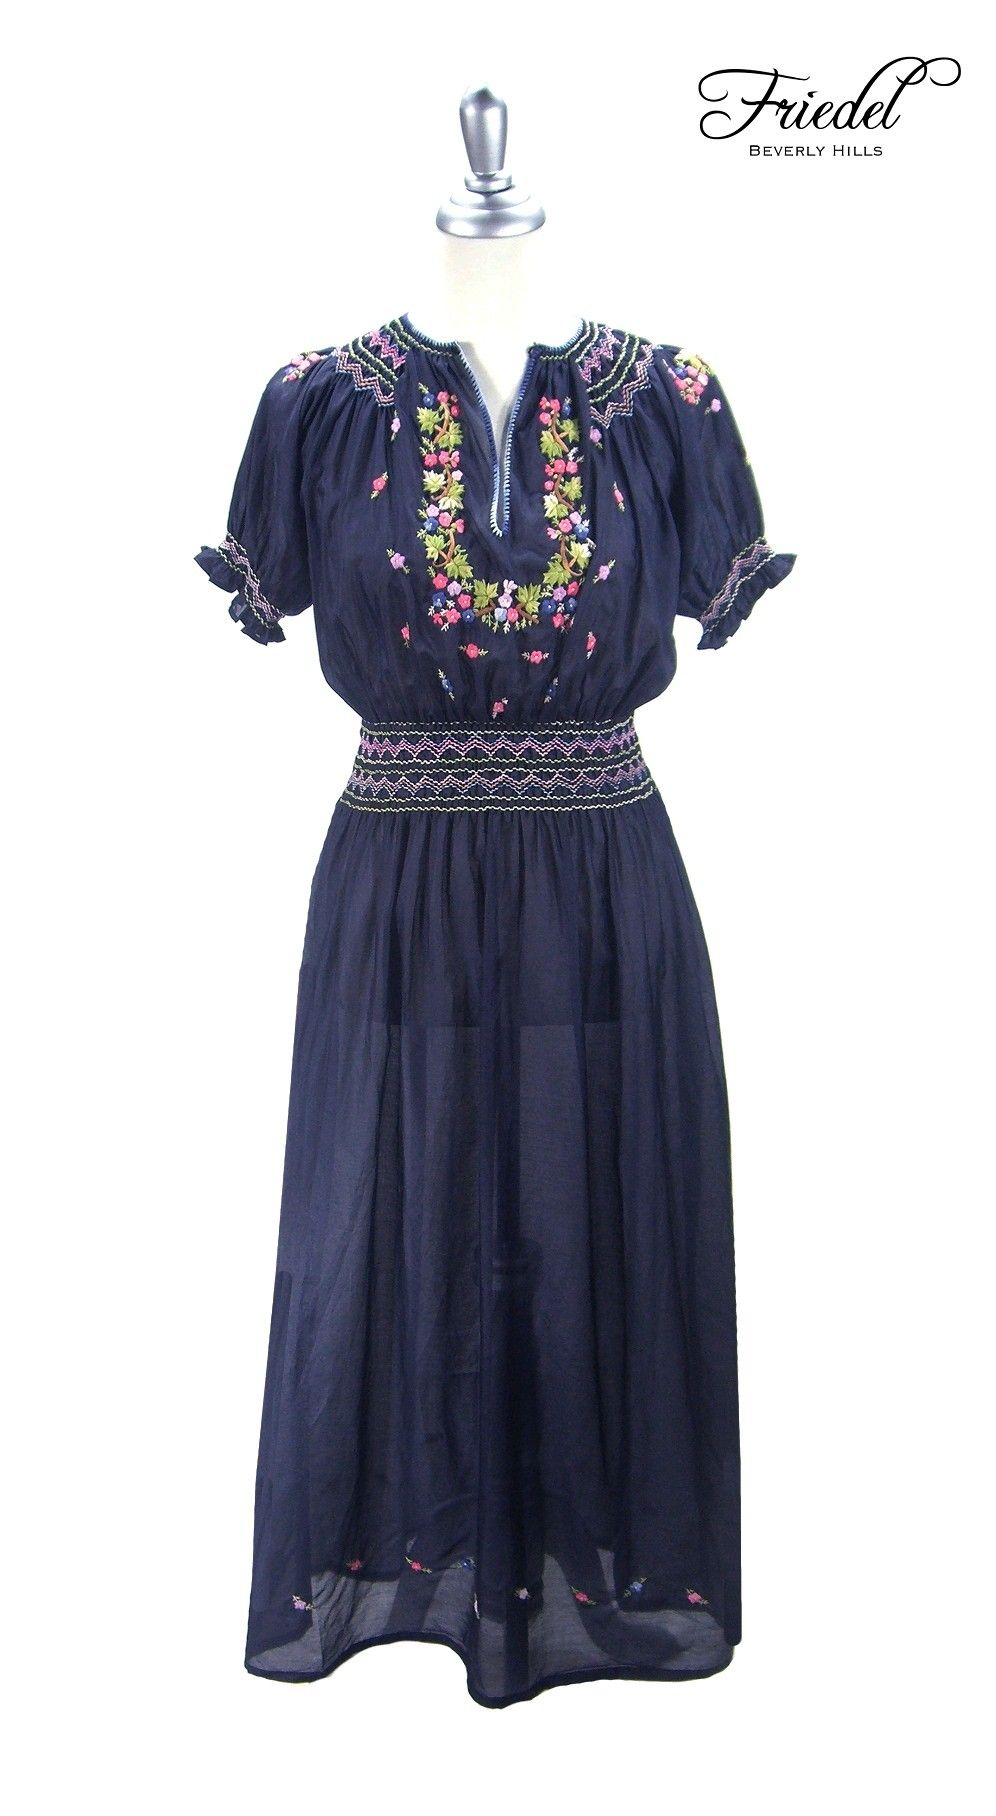 La esmeralda dress peasant luxe pinterest